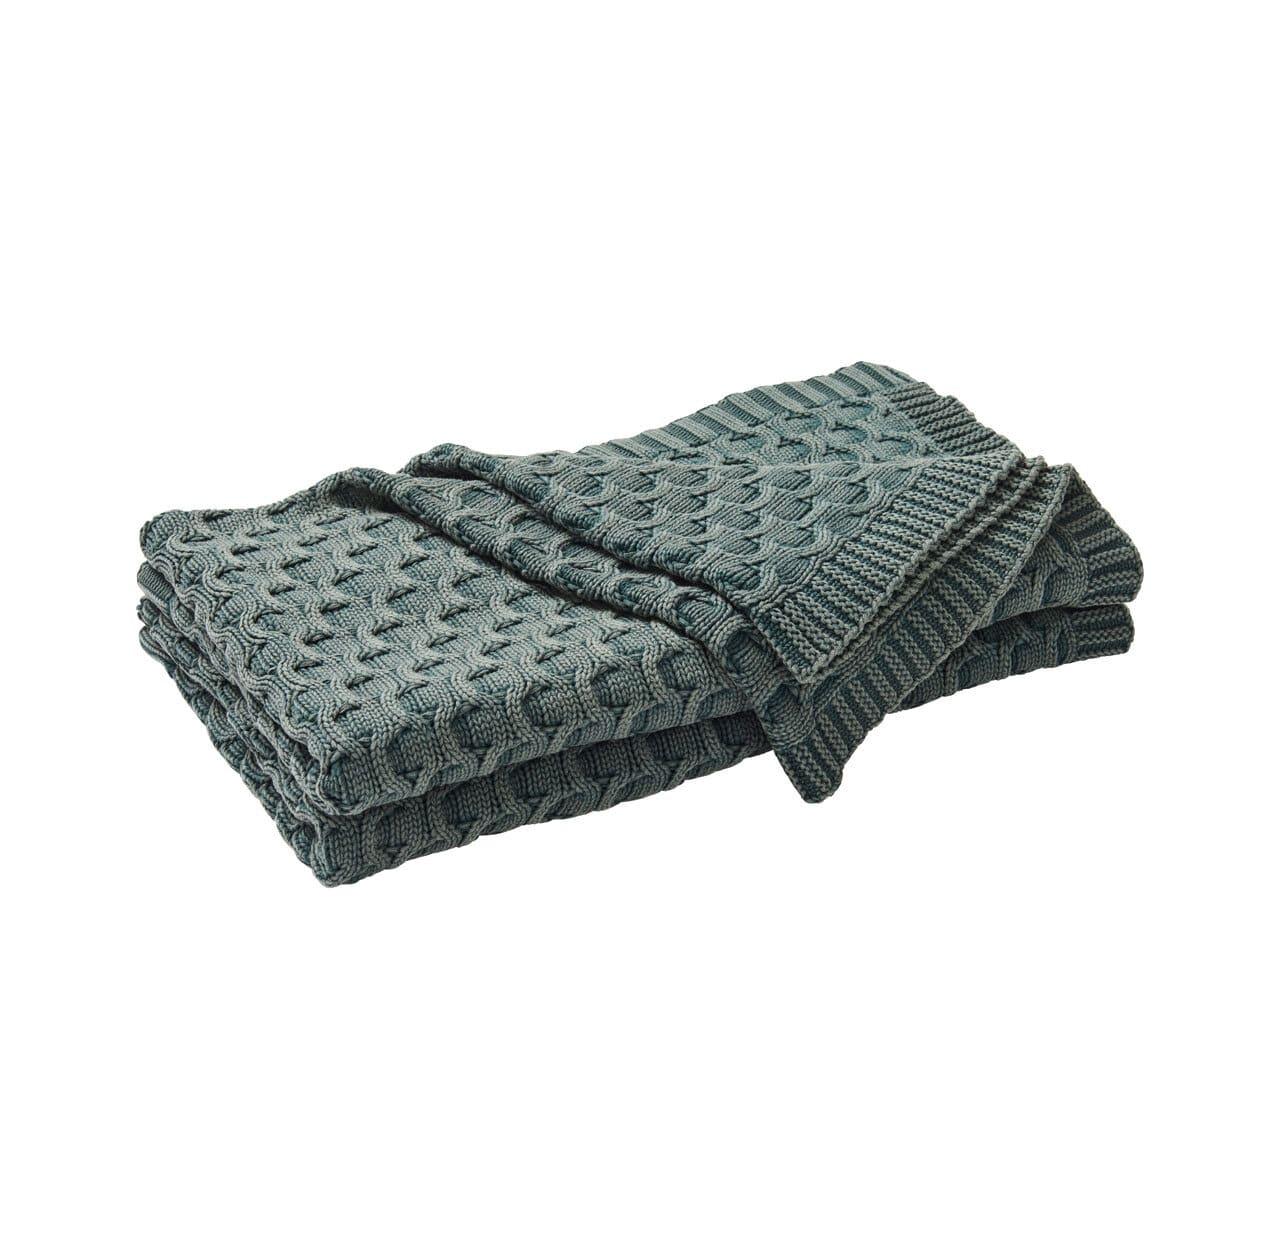 Delaney Throw Blanket - Ivy Green